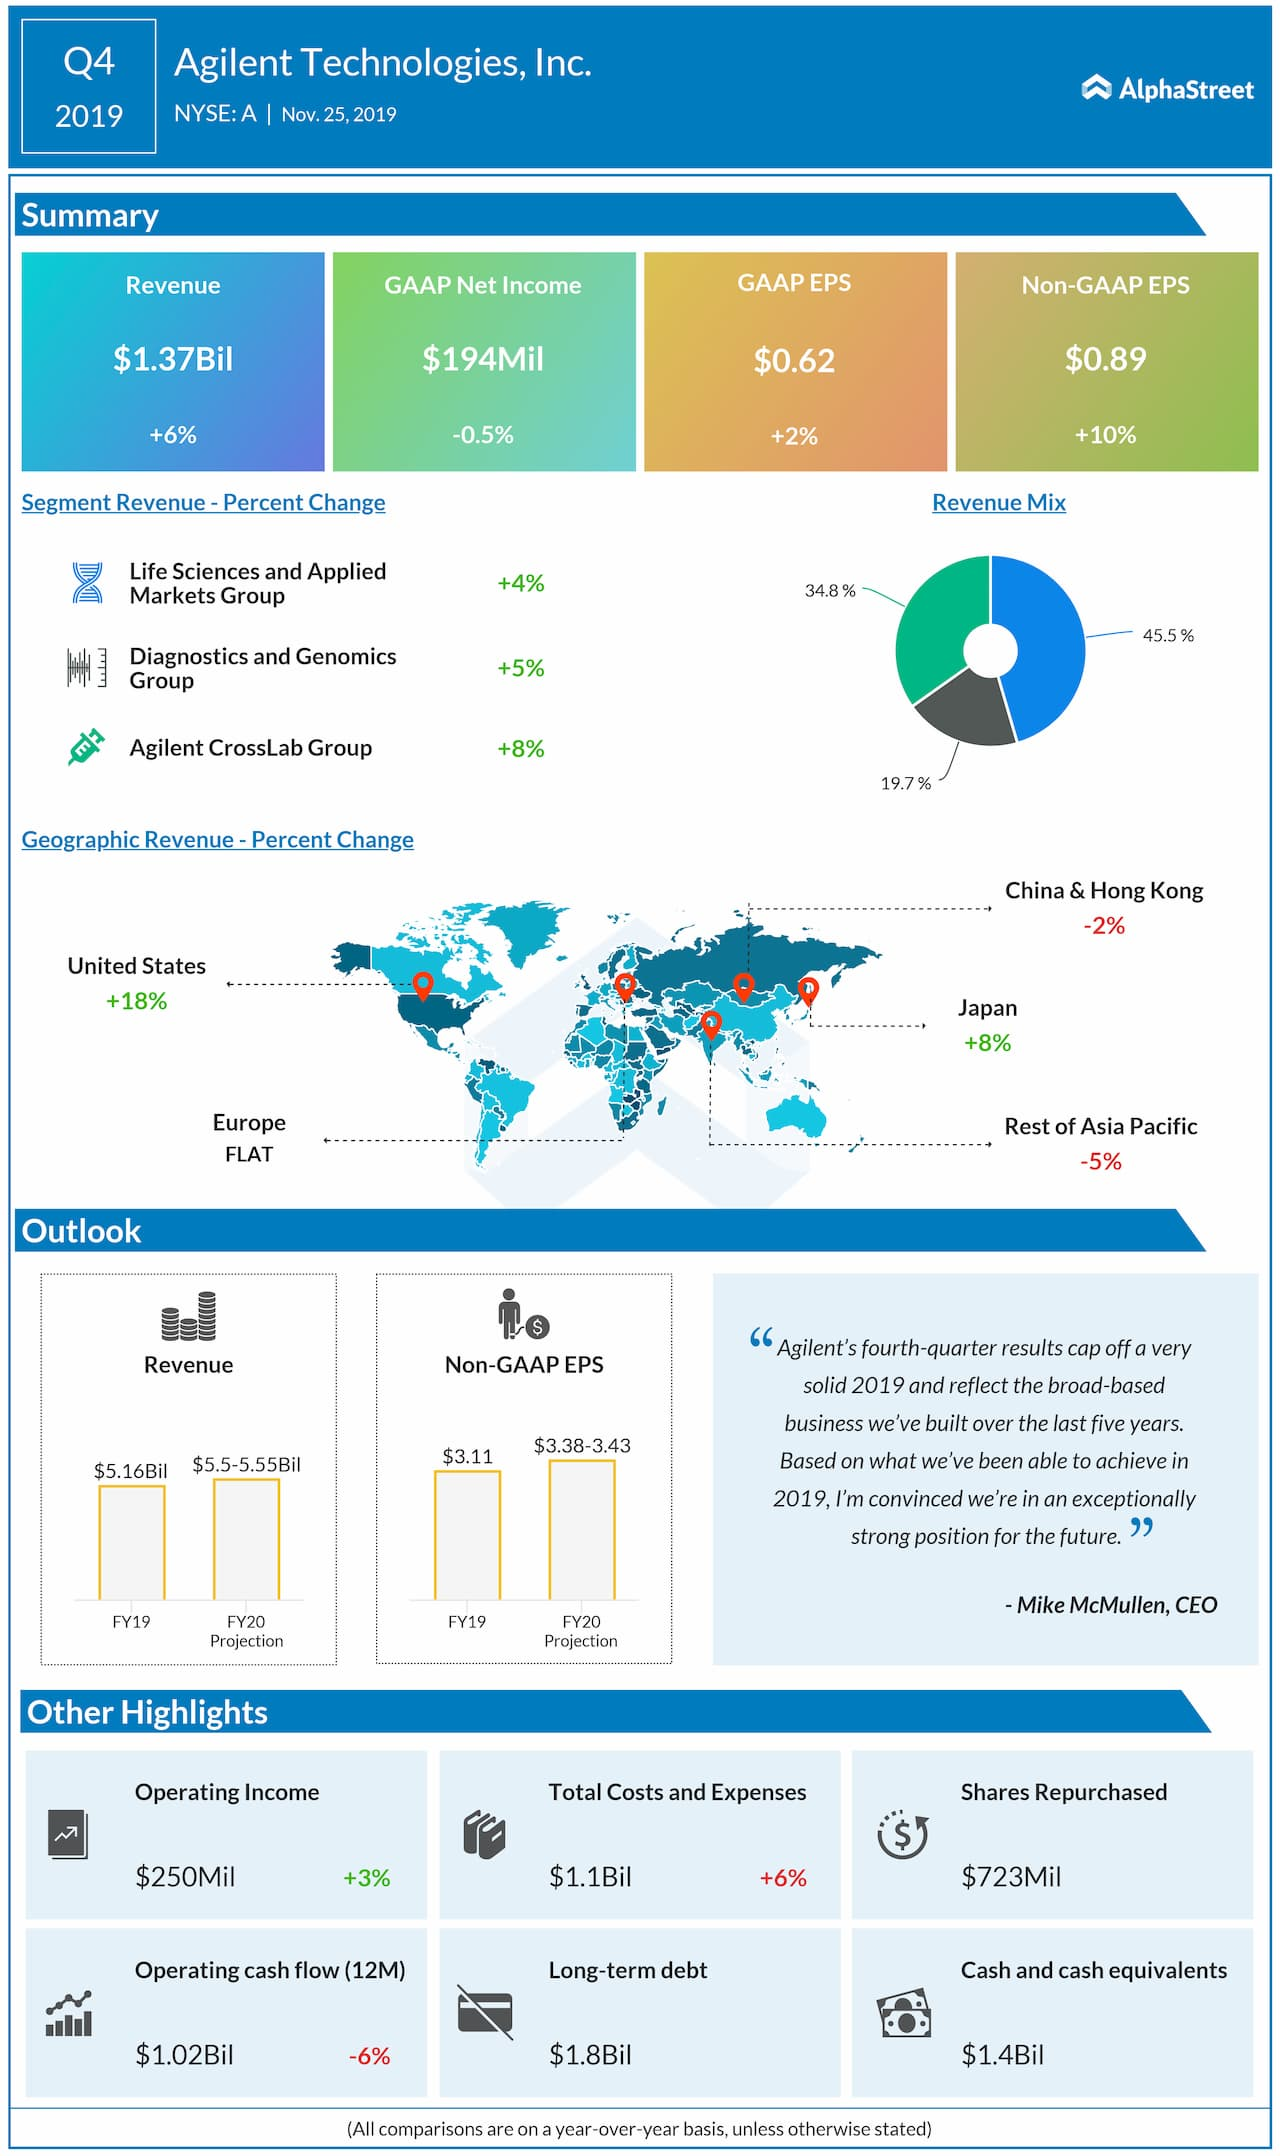 Agilent Technologies Q4 2019 Earnings Snapshot